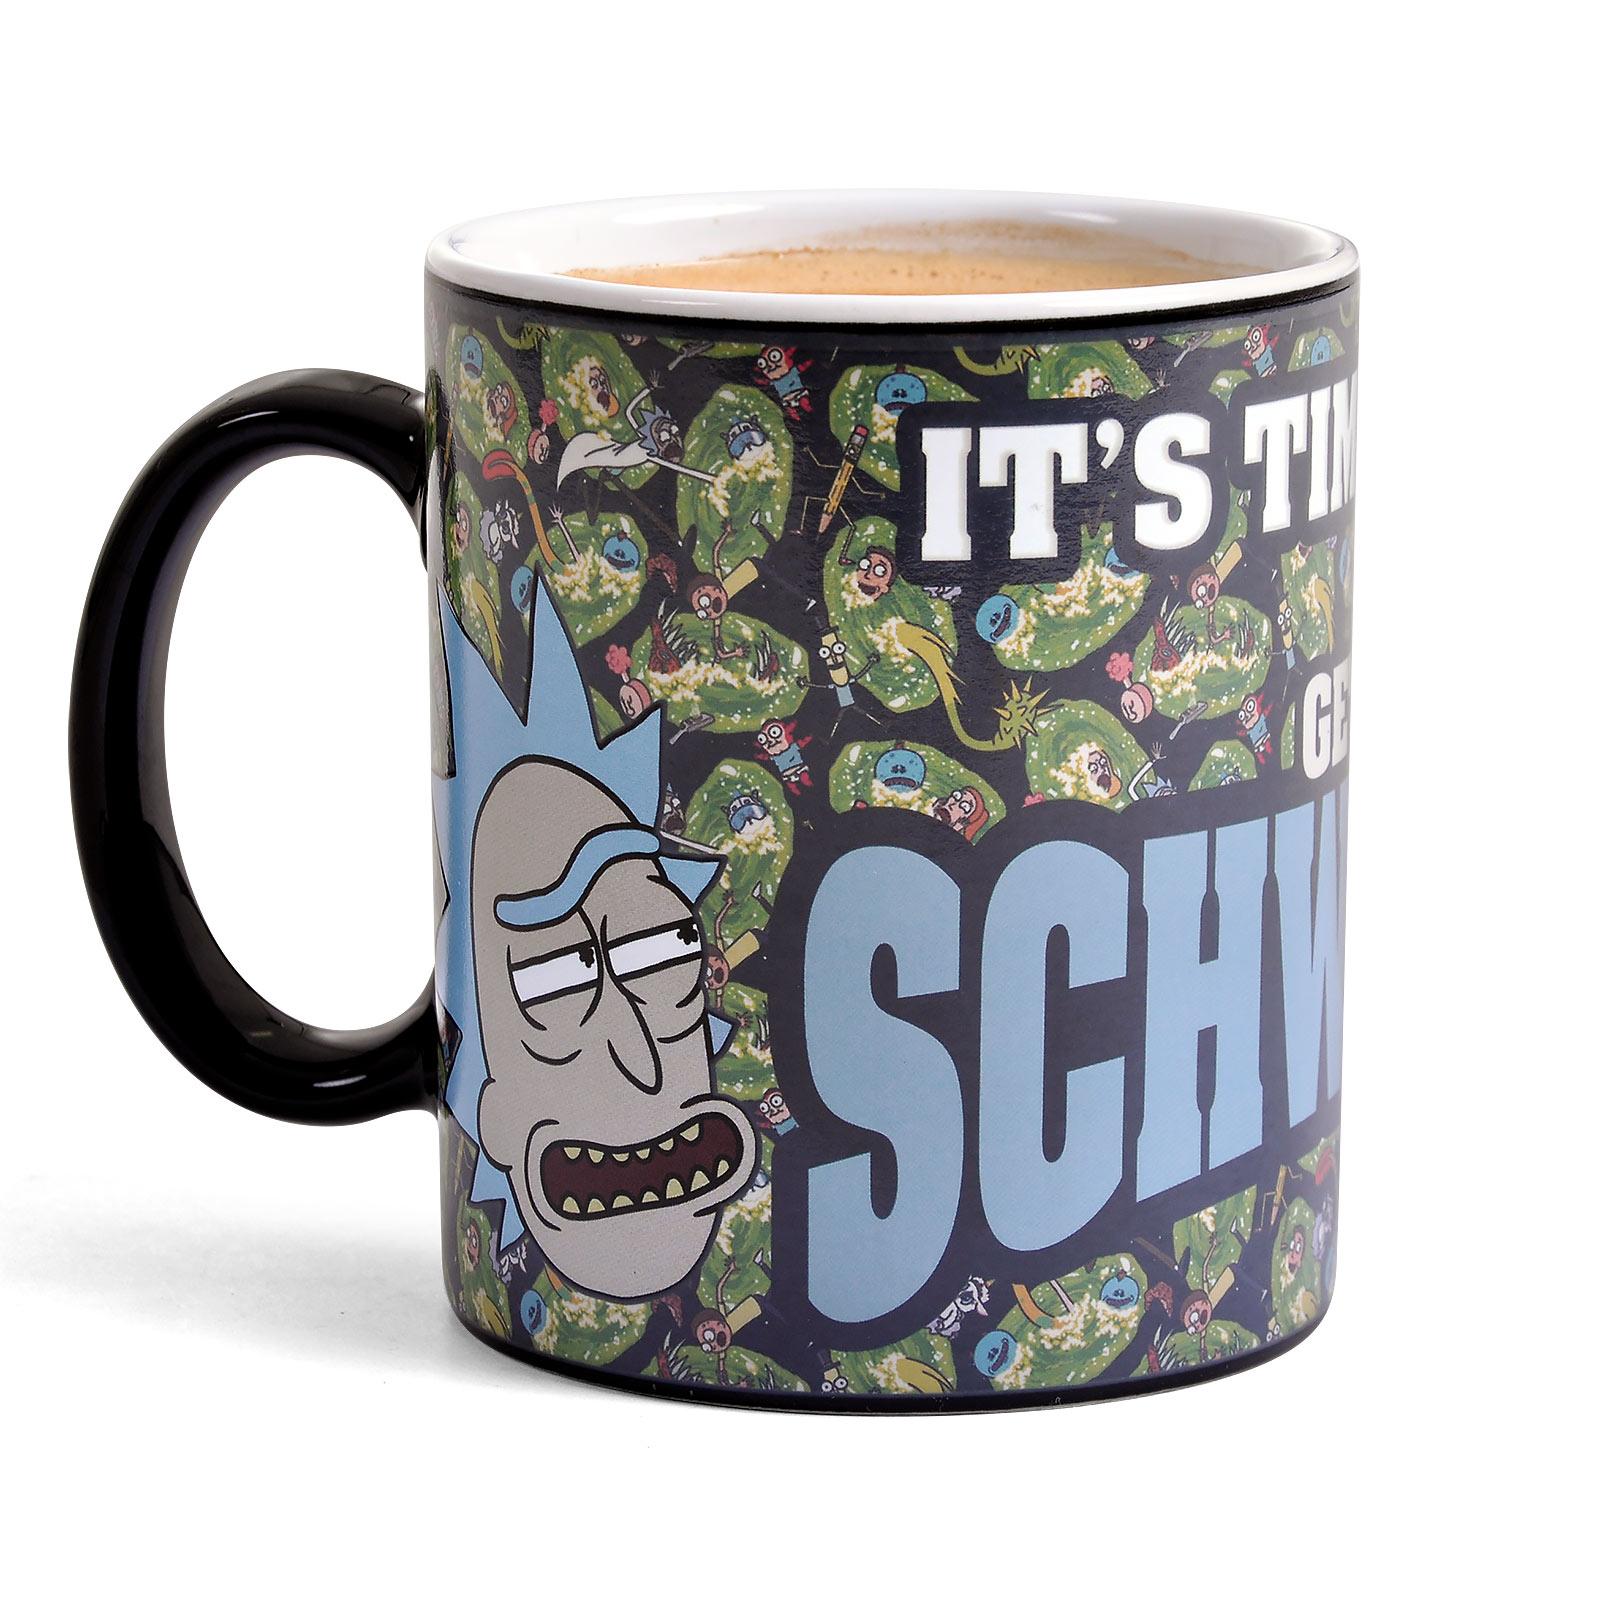 Rick and Morty - Get Schwifty Thermoeffekt Tasse